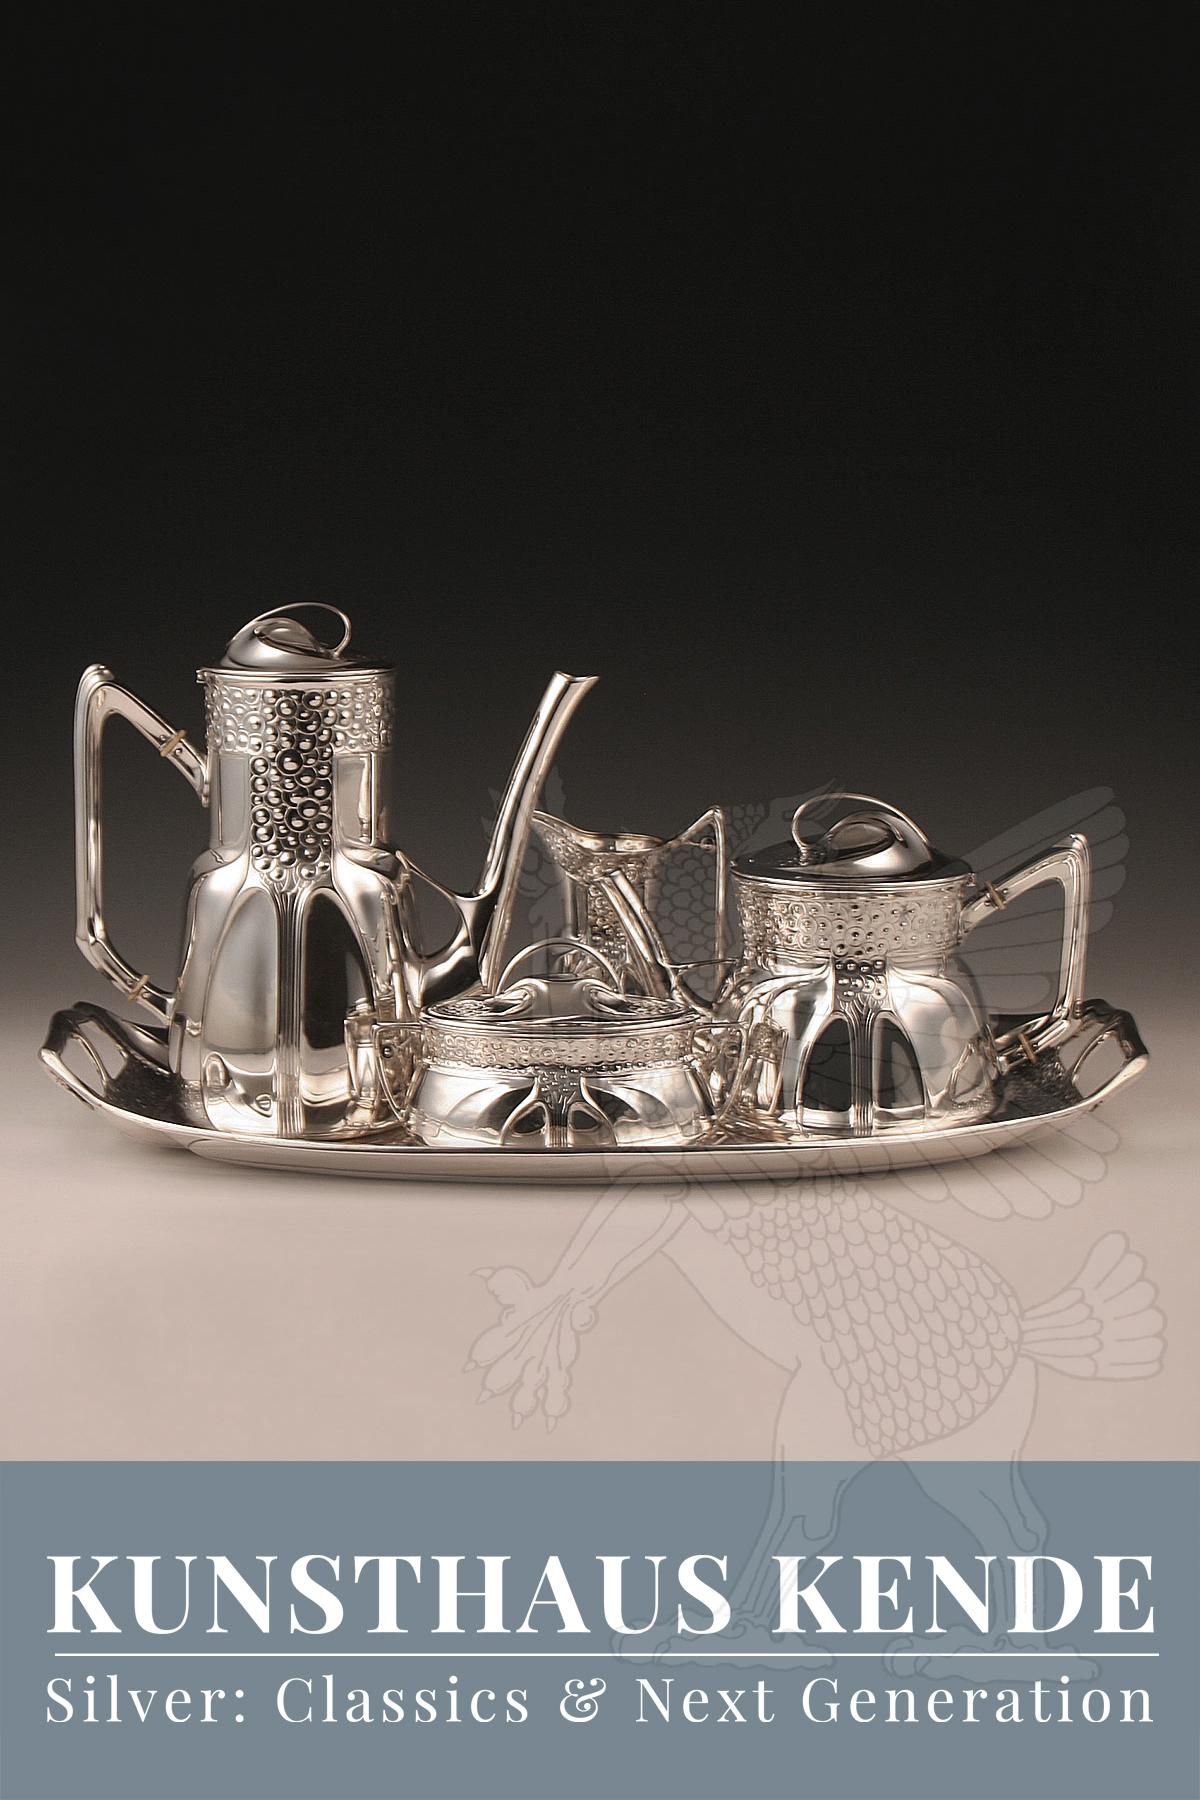 Orivit Jardiniere Silber Weinkühler Jugendstil Vase Kaffeeservice Tablett oag